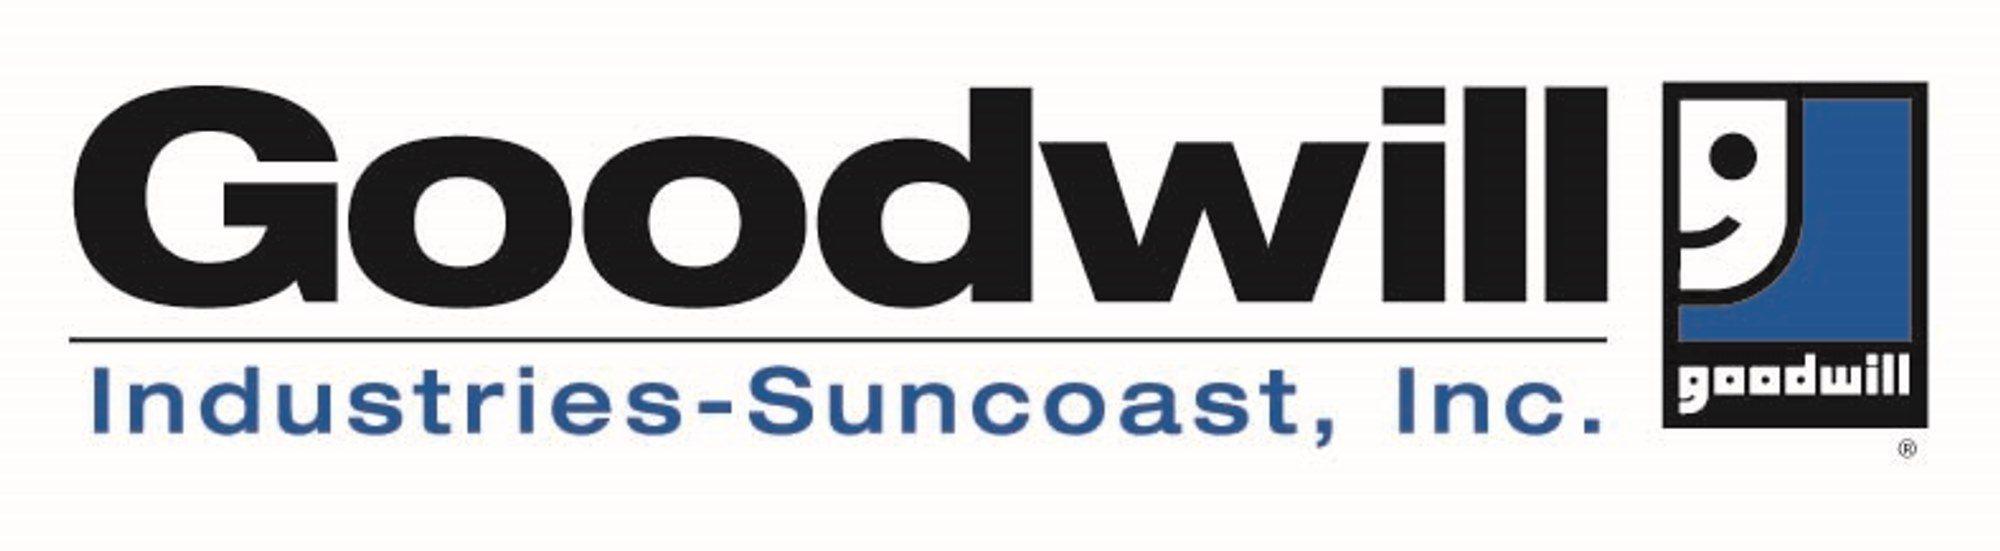 Goodwill Industries-Suncoast, Inc. Logo